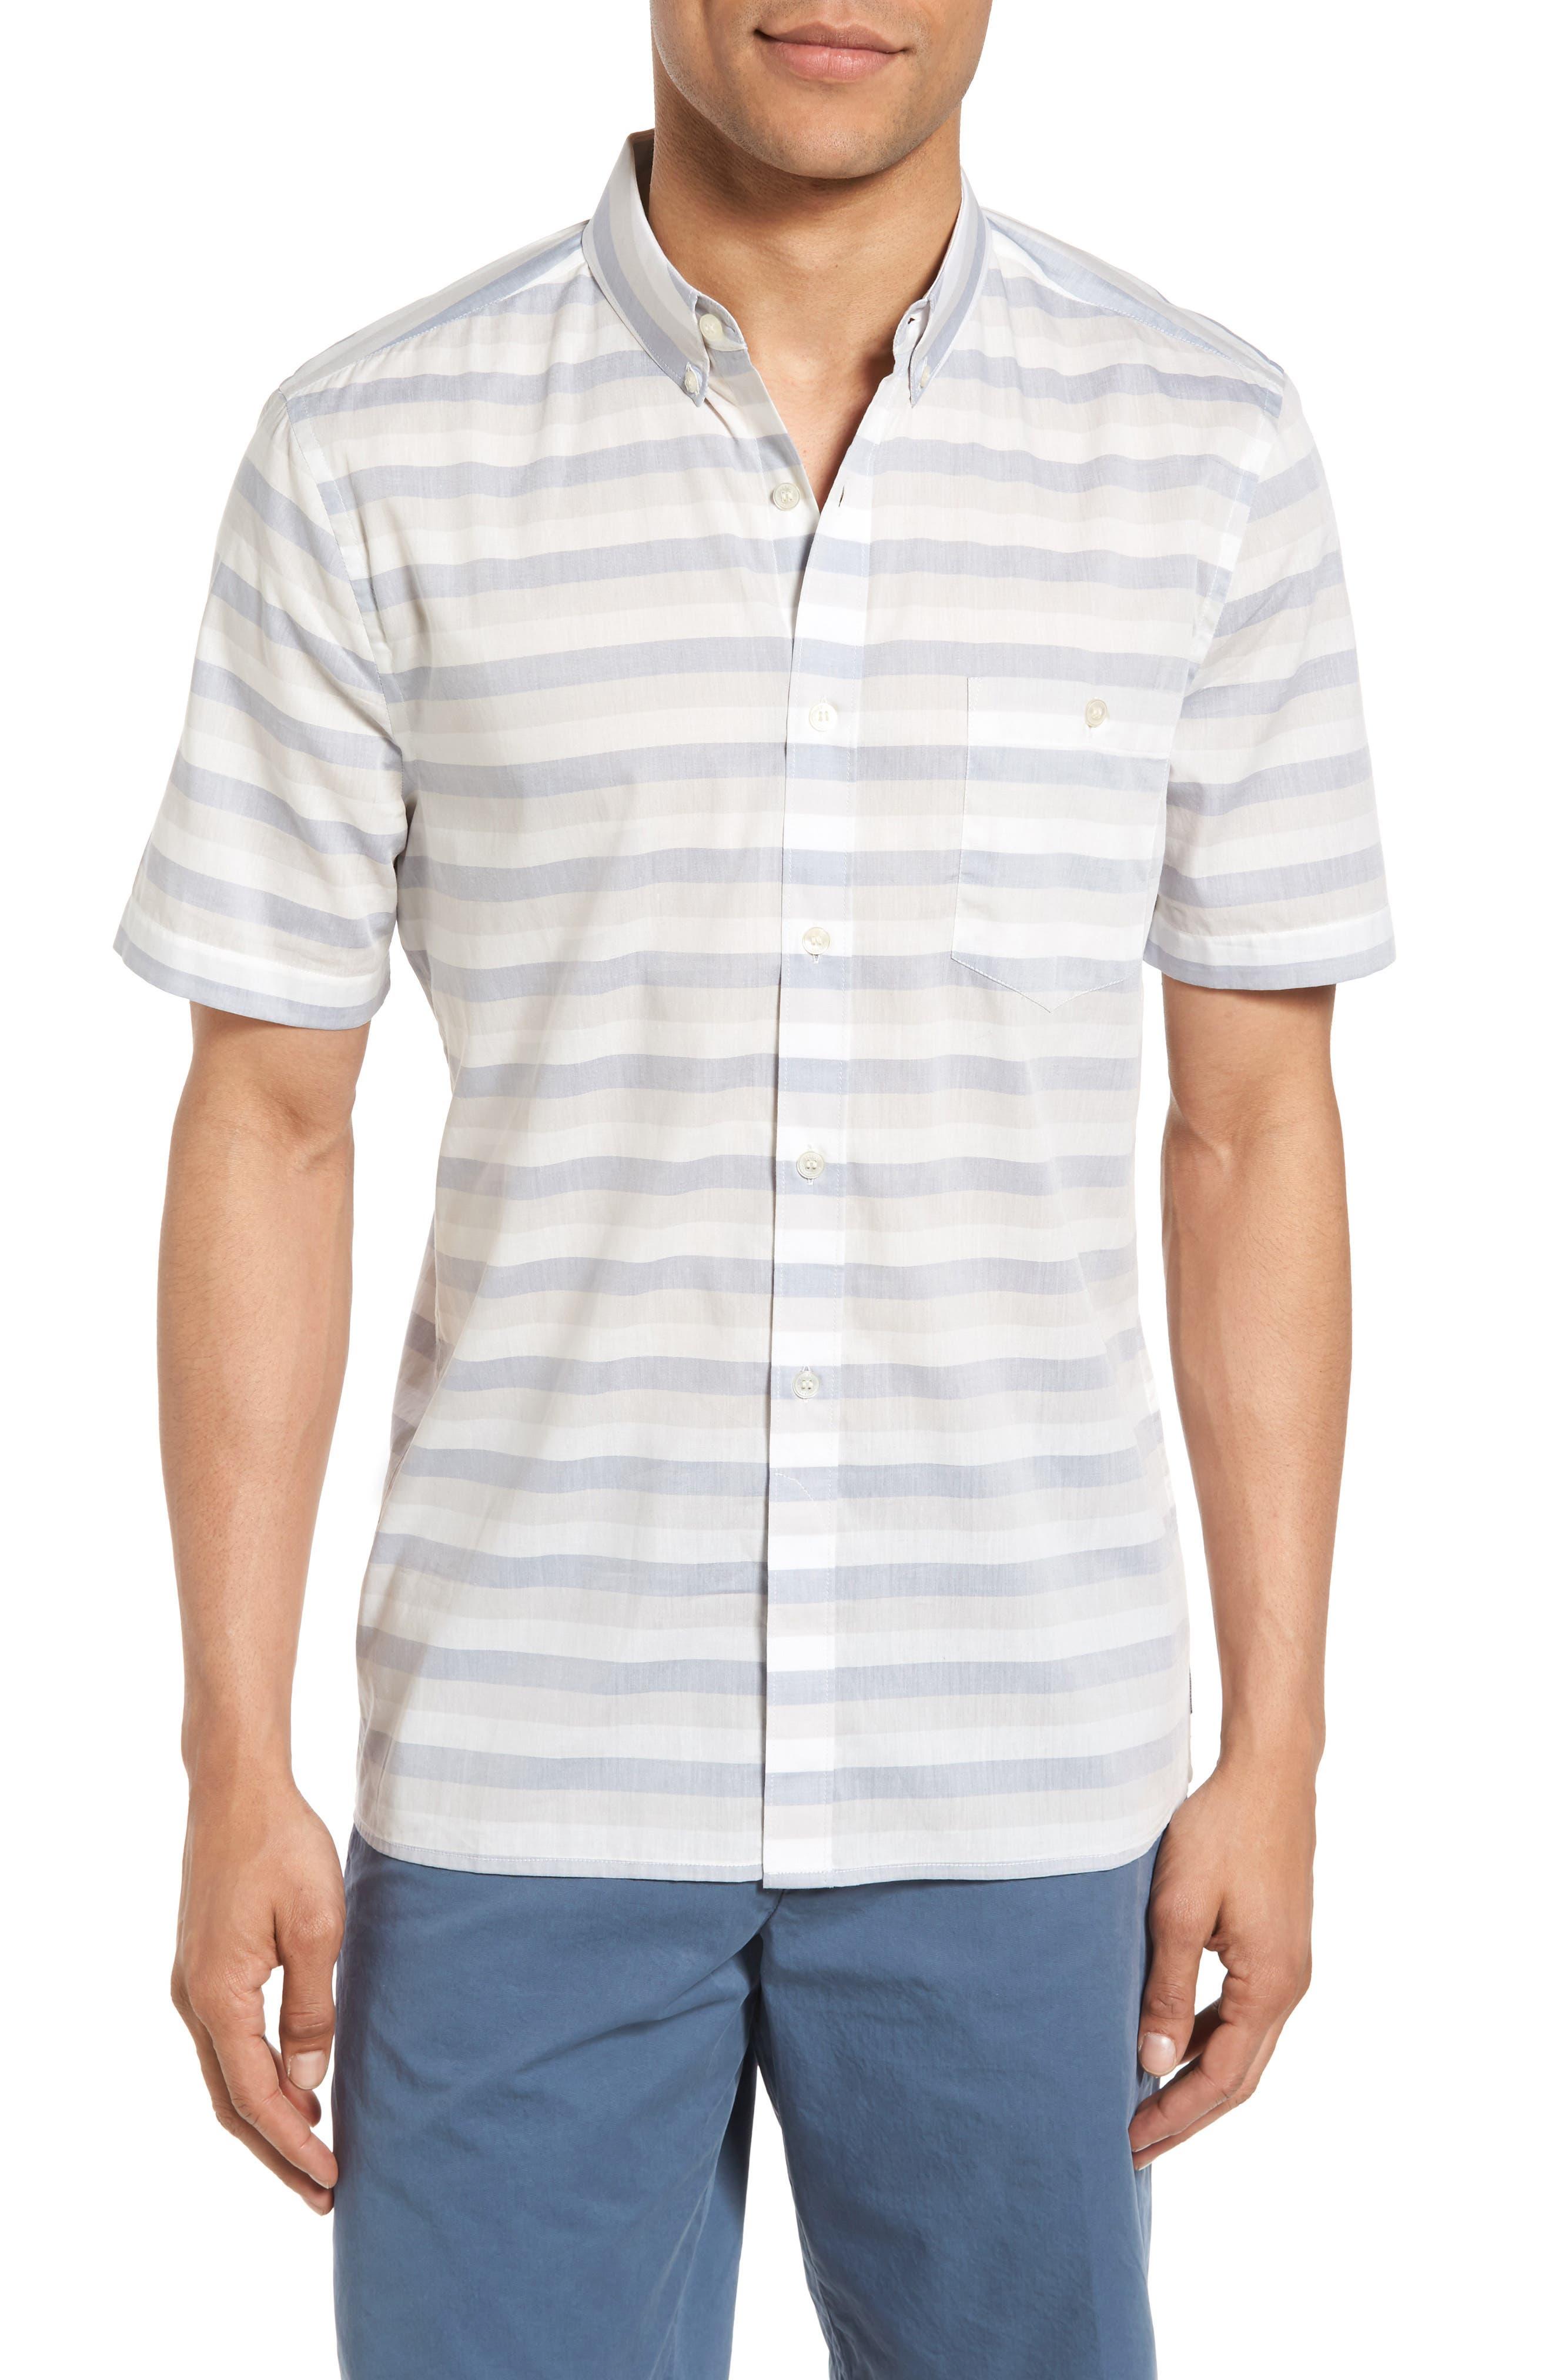 French Connection Lifeline Stripe Cotton Shirt